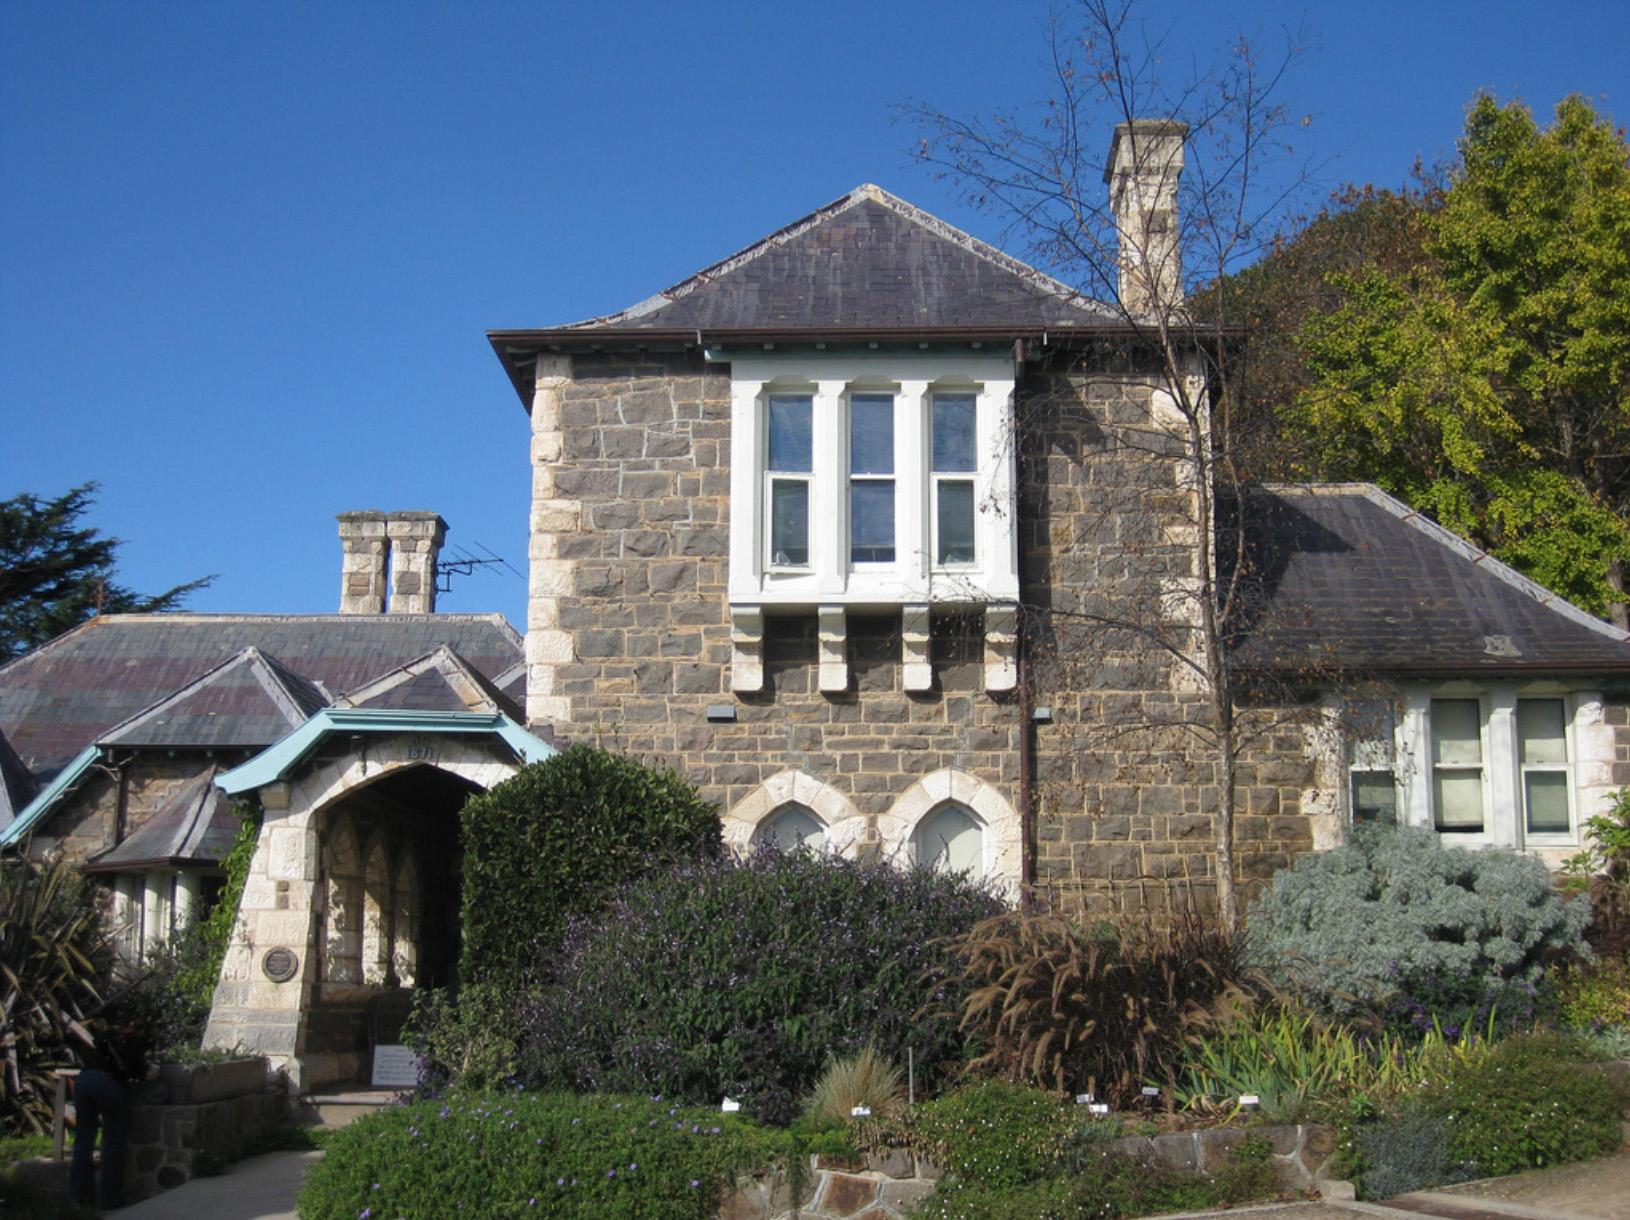 heronswood historical house and garden - dromana copy.jpg